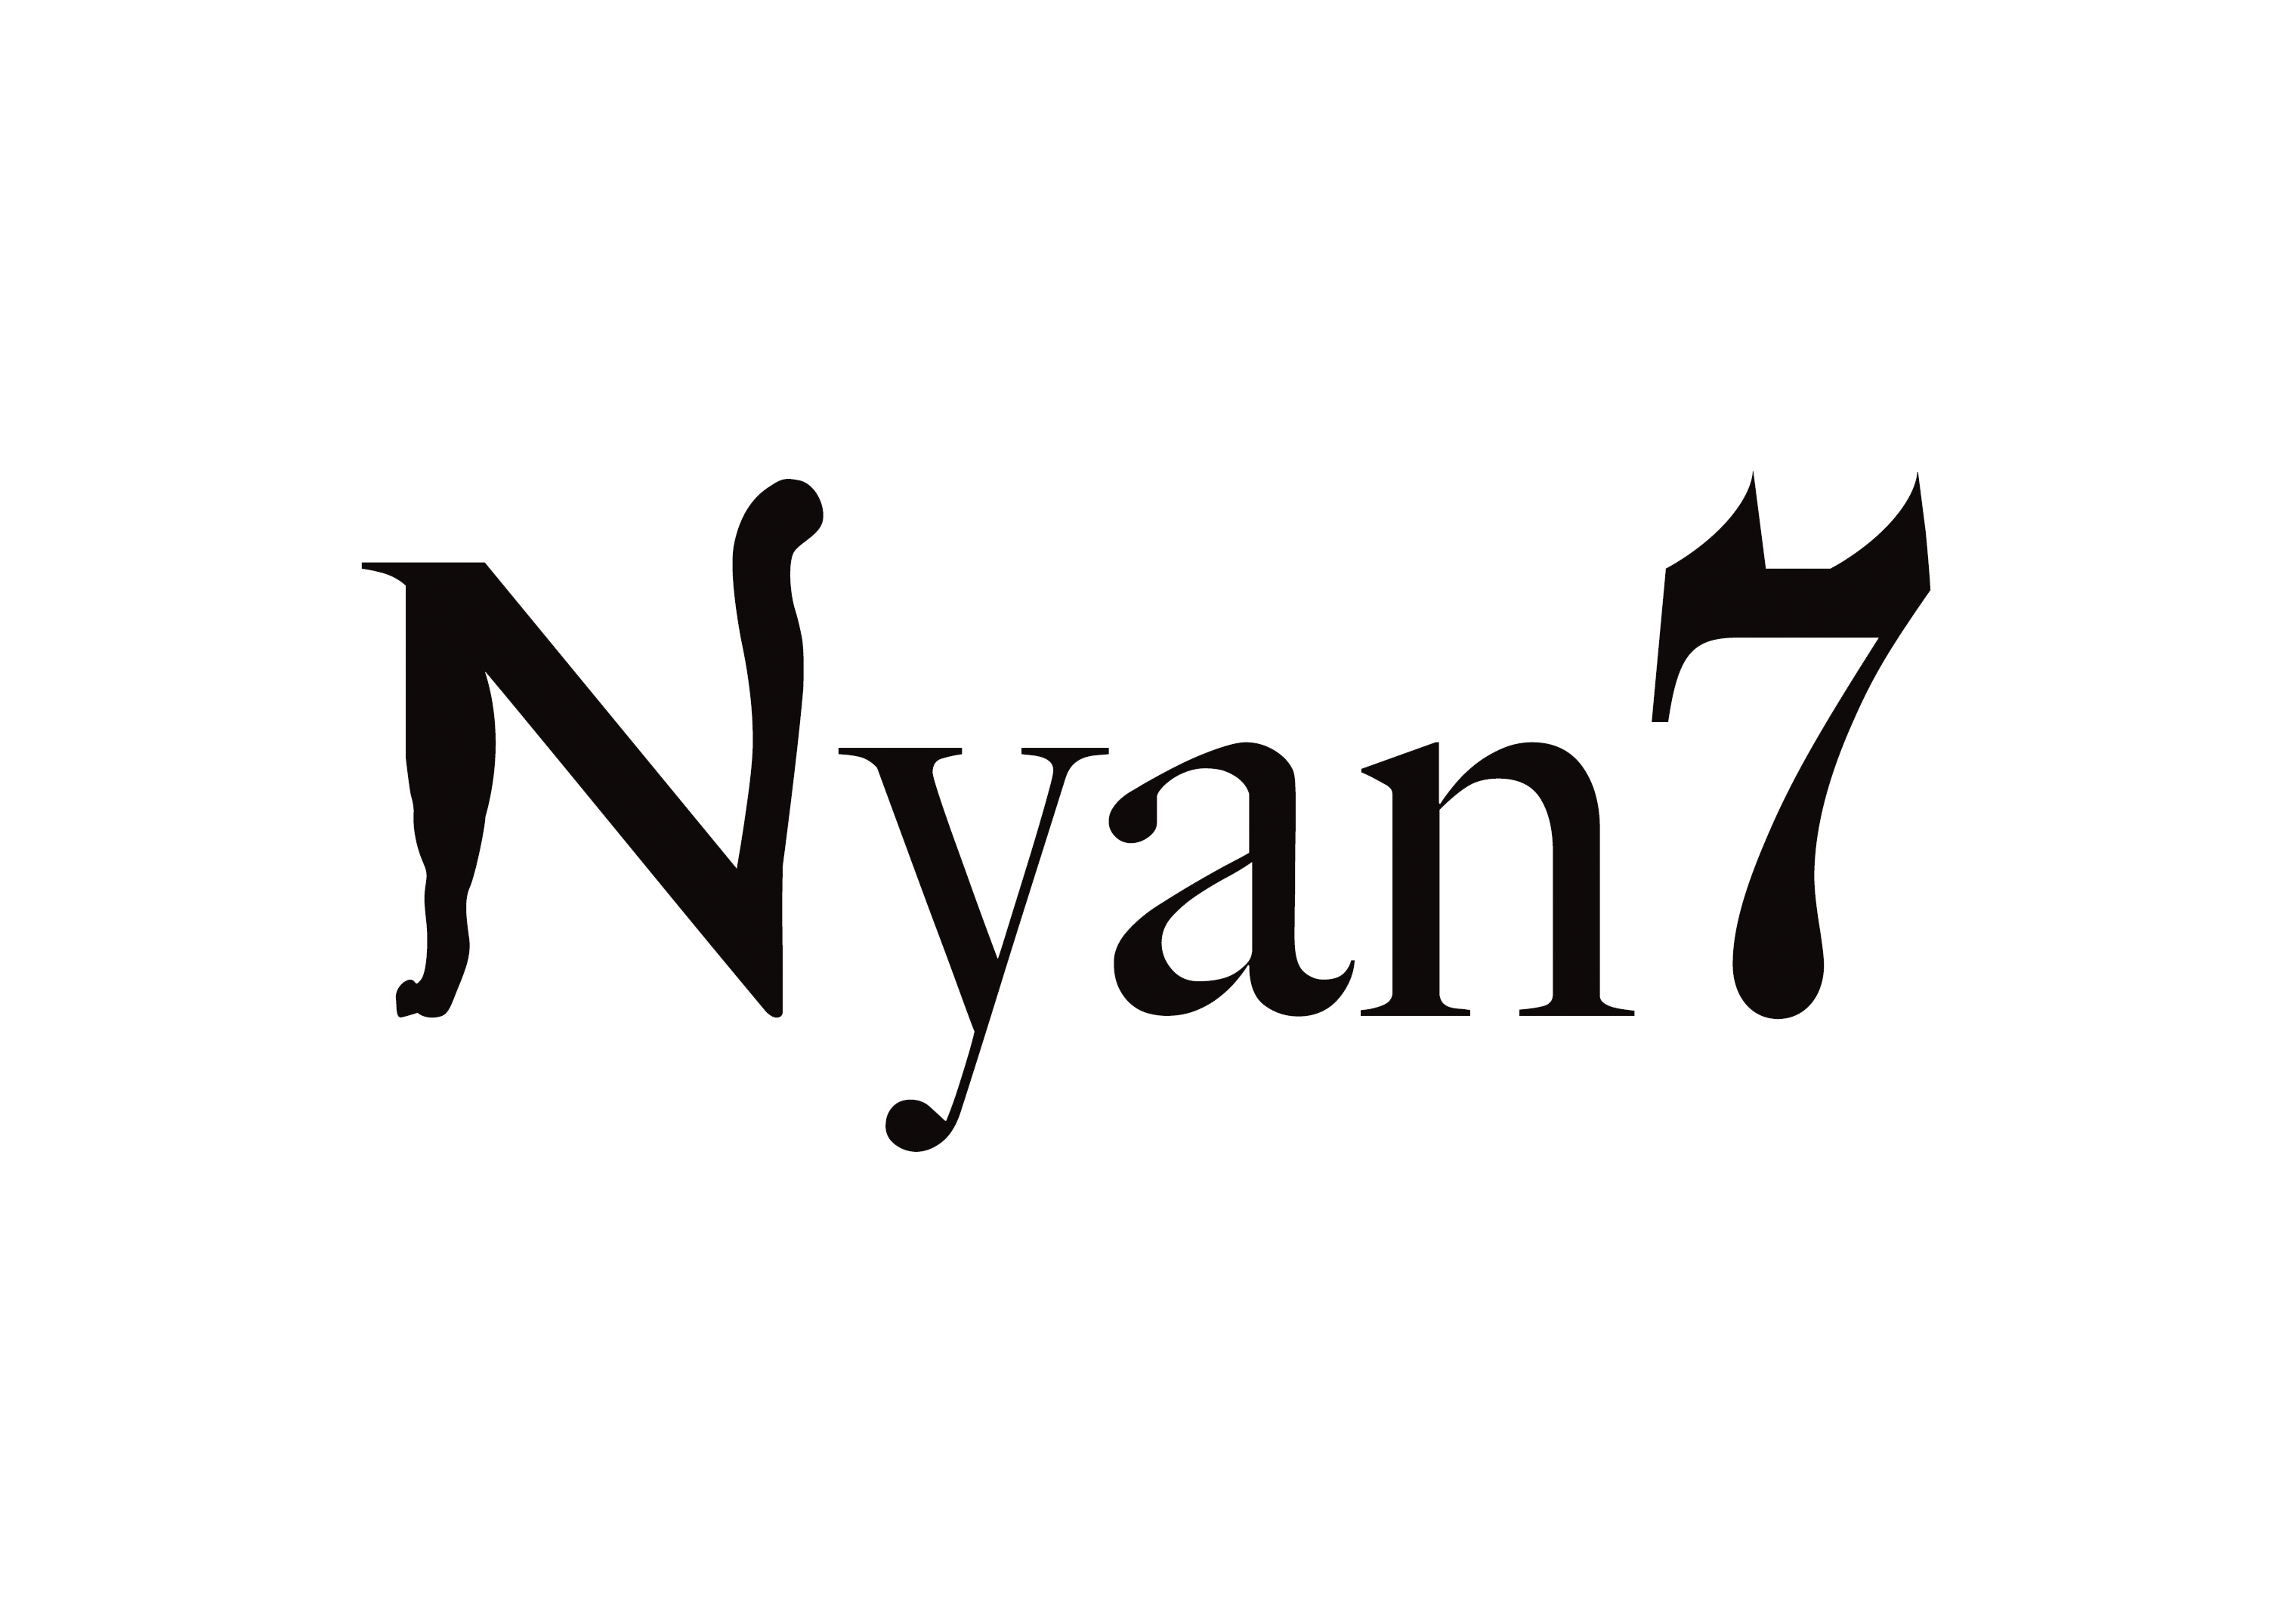 Nyan7(にゃんなな)オフィシャルサイト